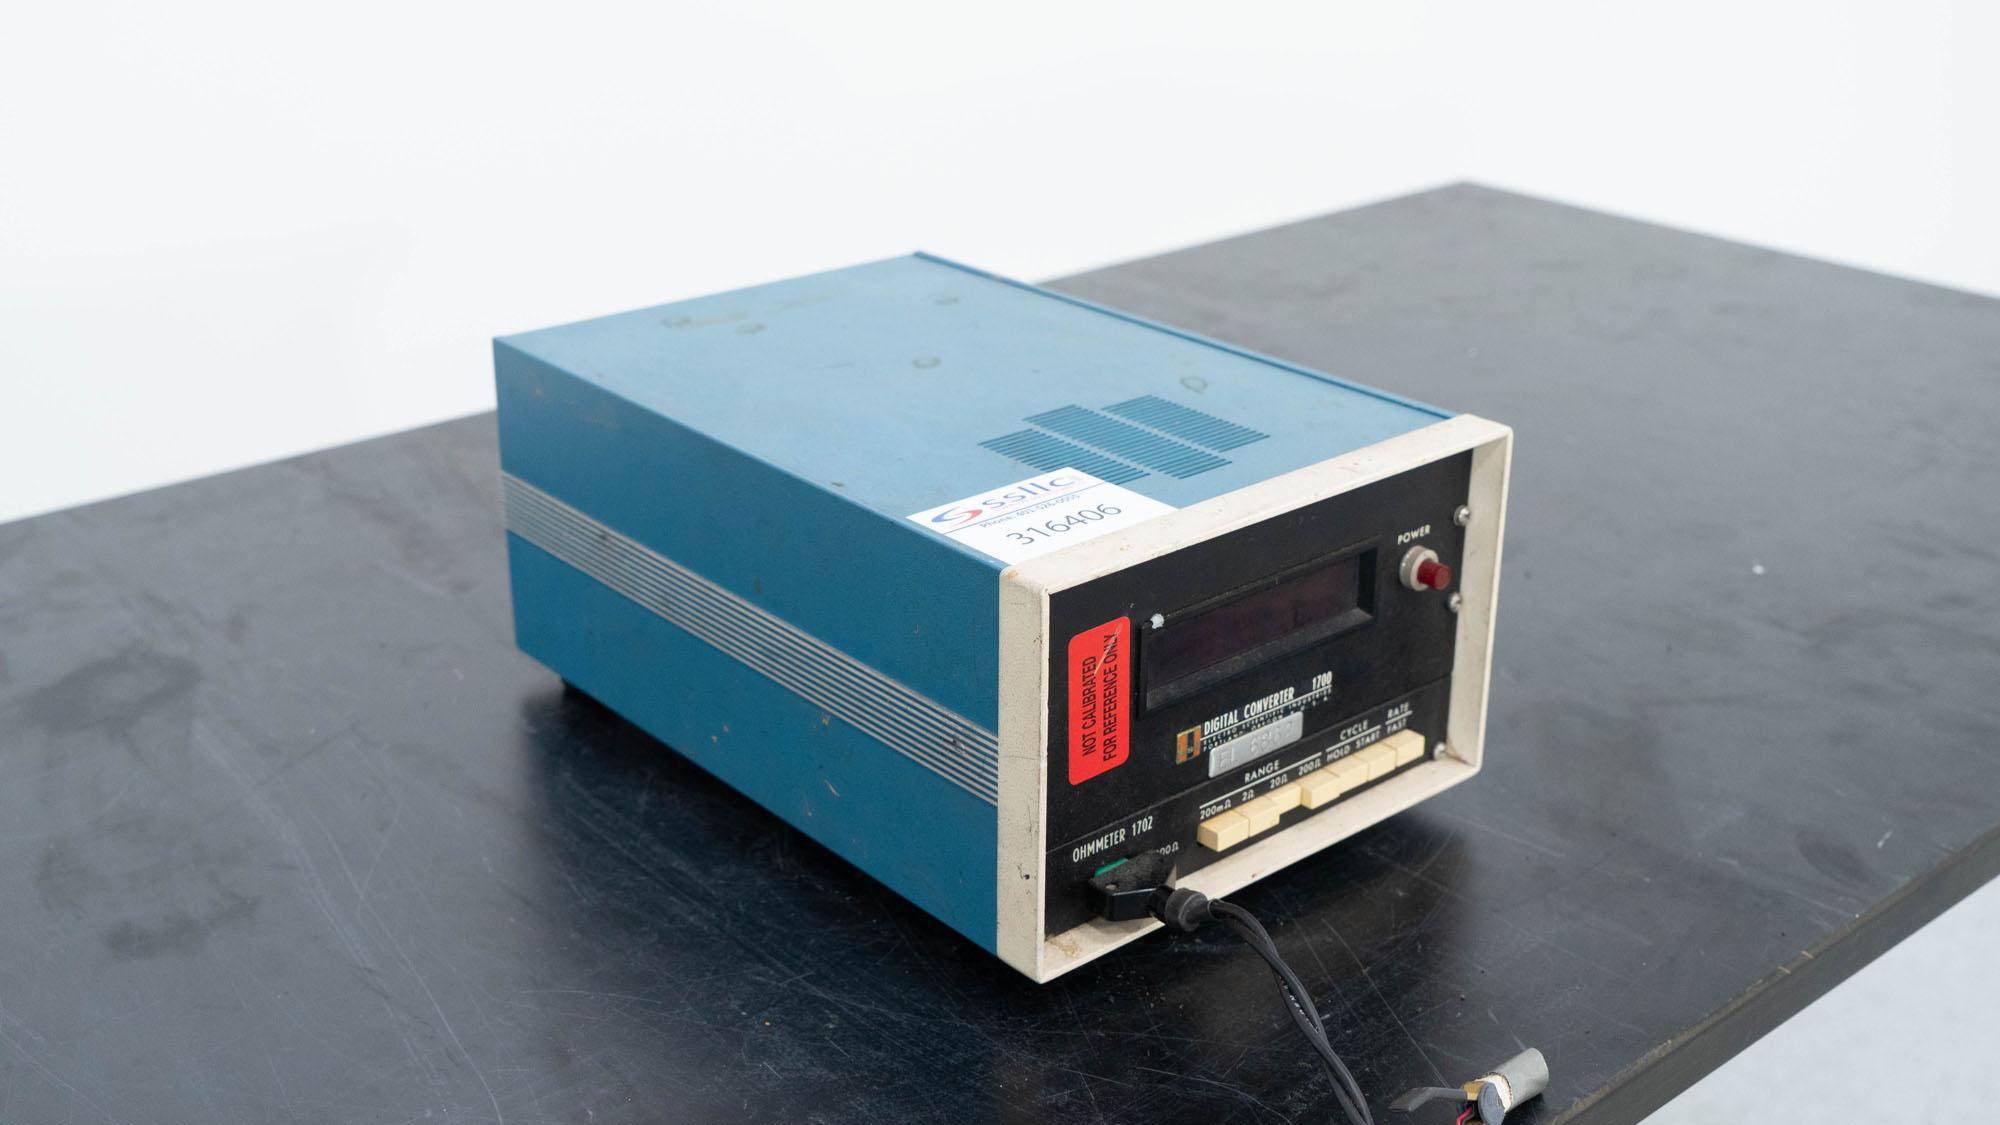 Electro Scientific Digital Converter, Model 1700